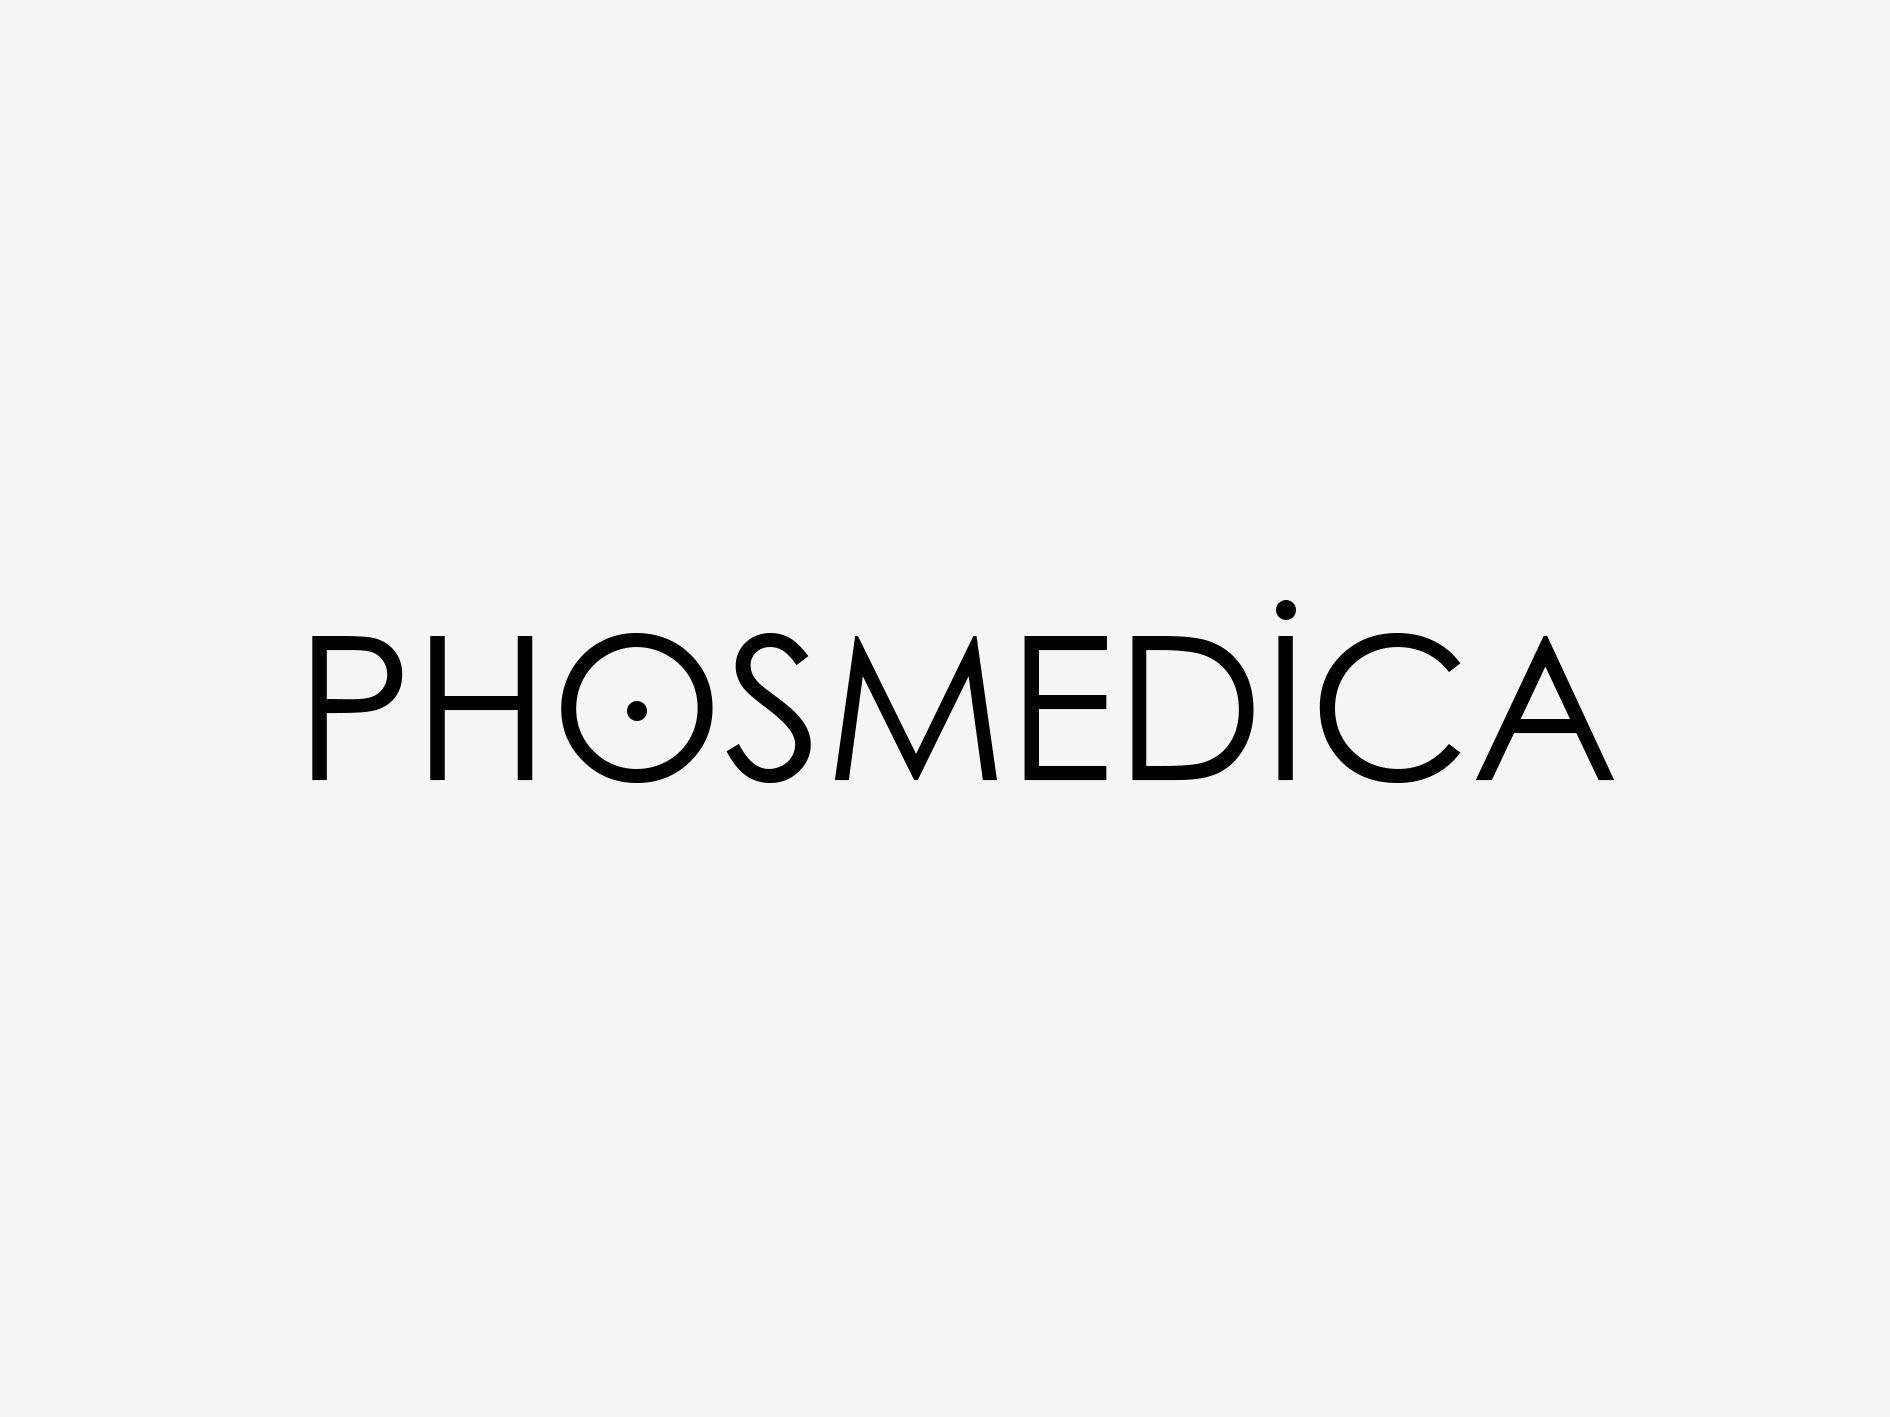 Phosmedica